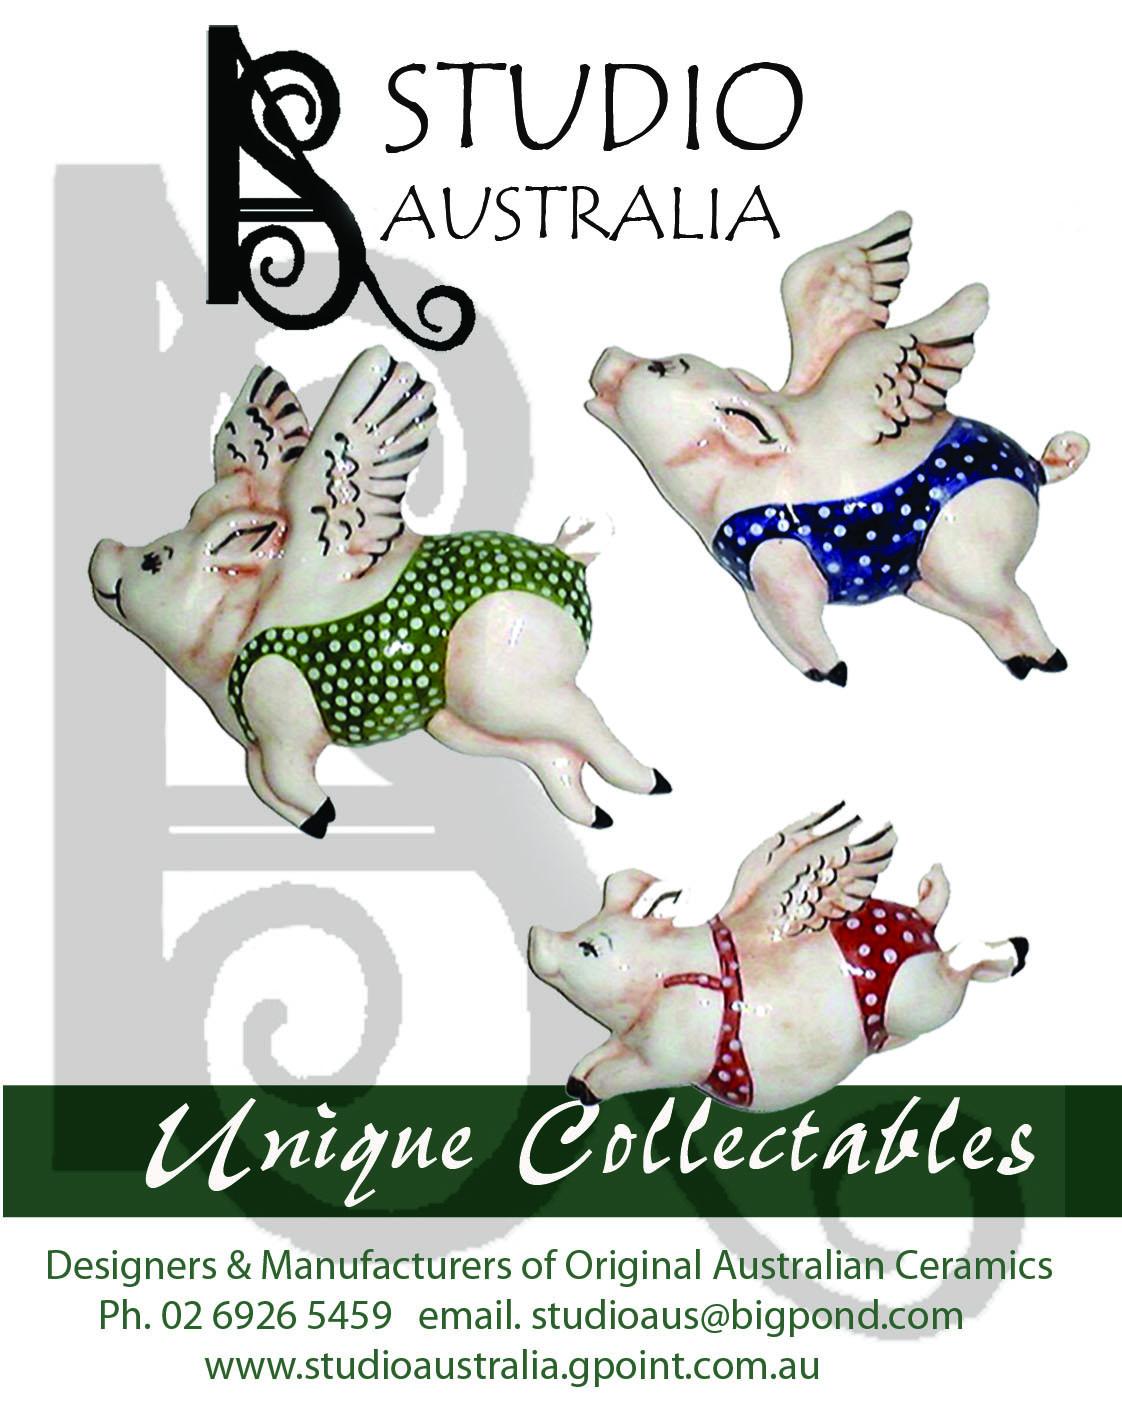 Studio australia creative riverina for Studio australia